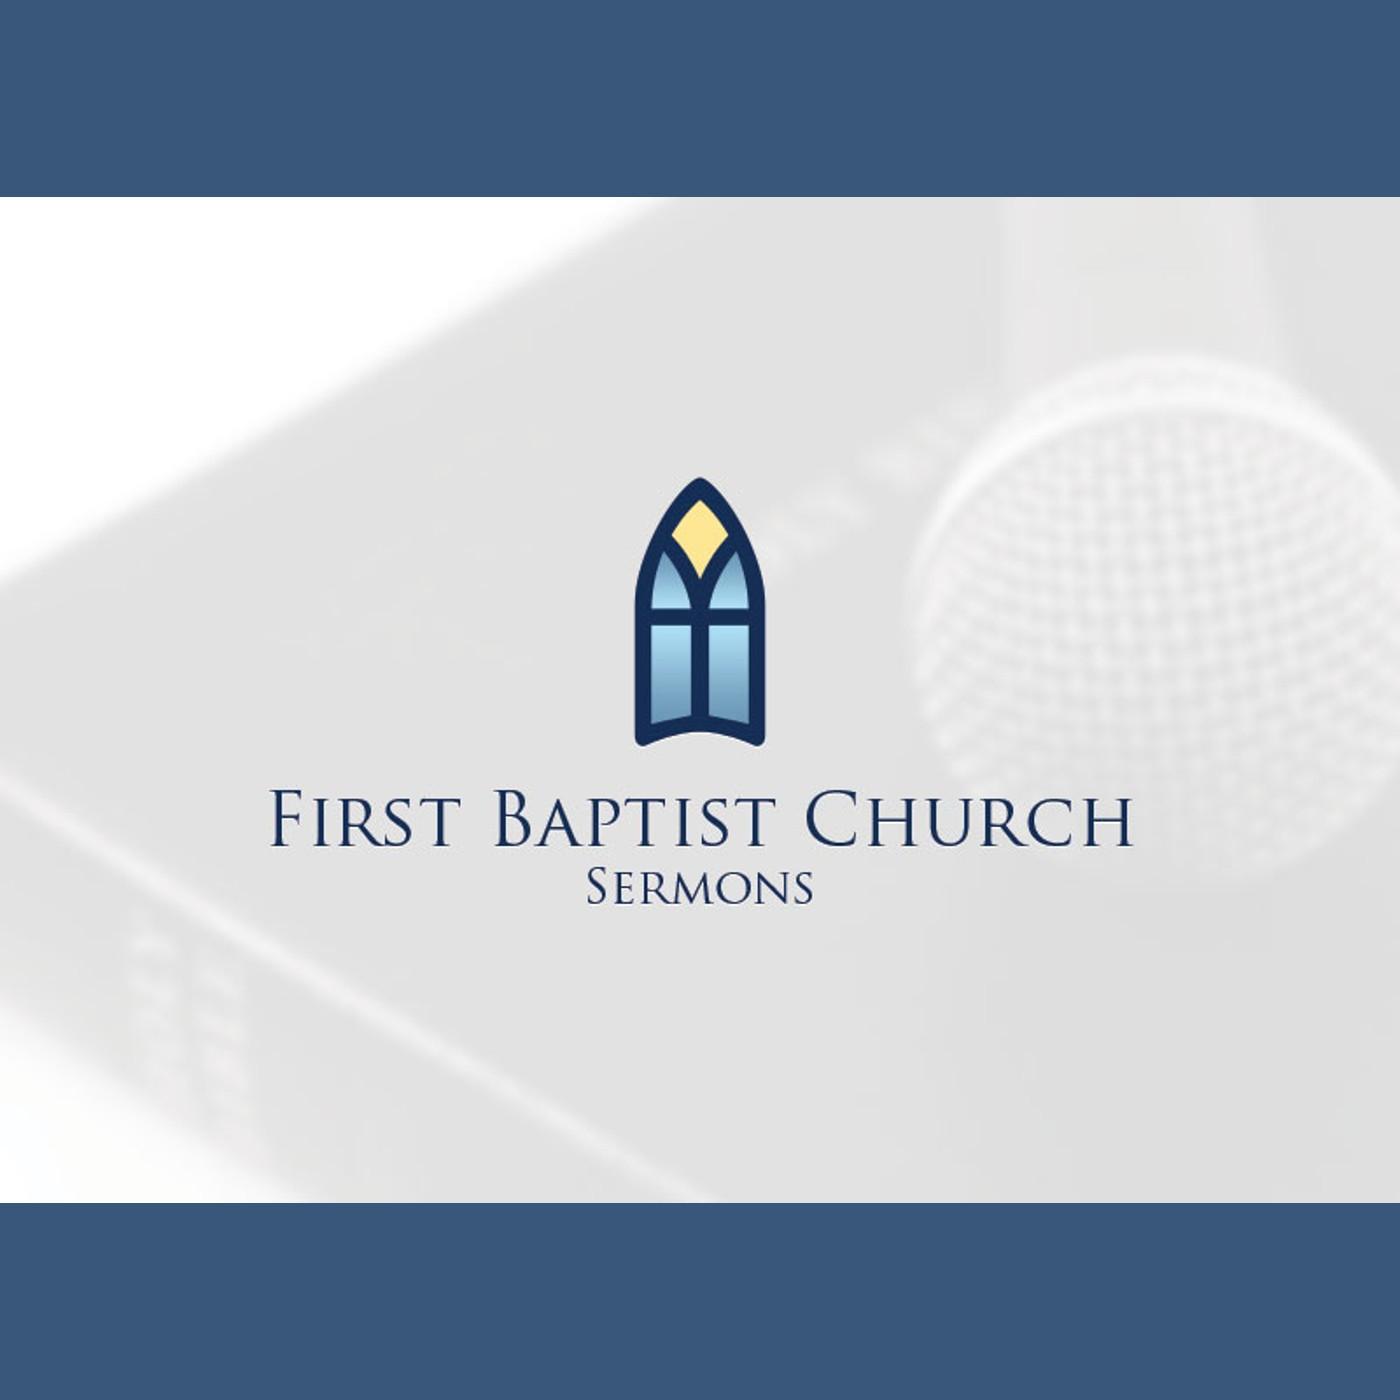 First Baptist Church of Eureka, KS